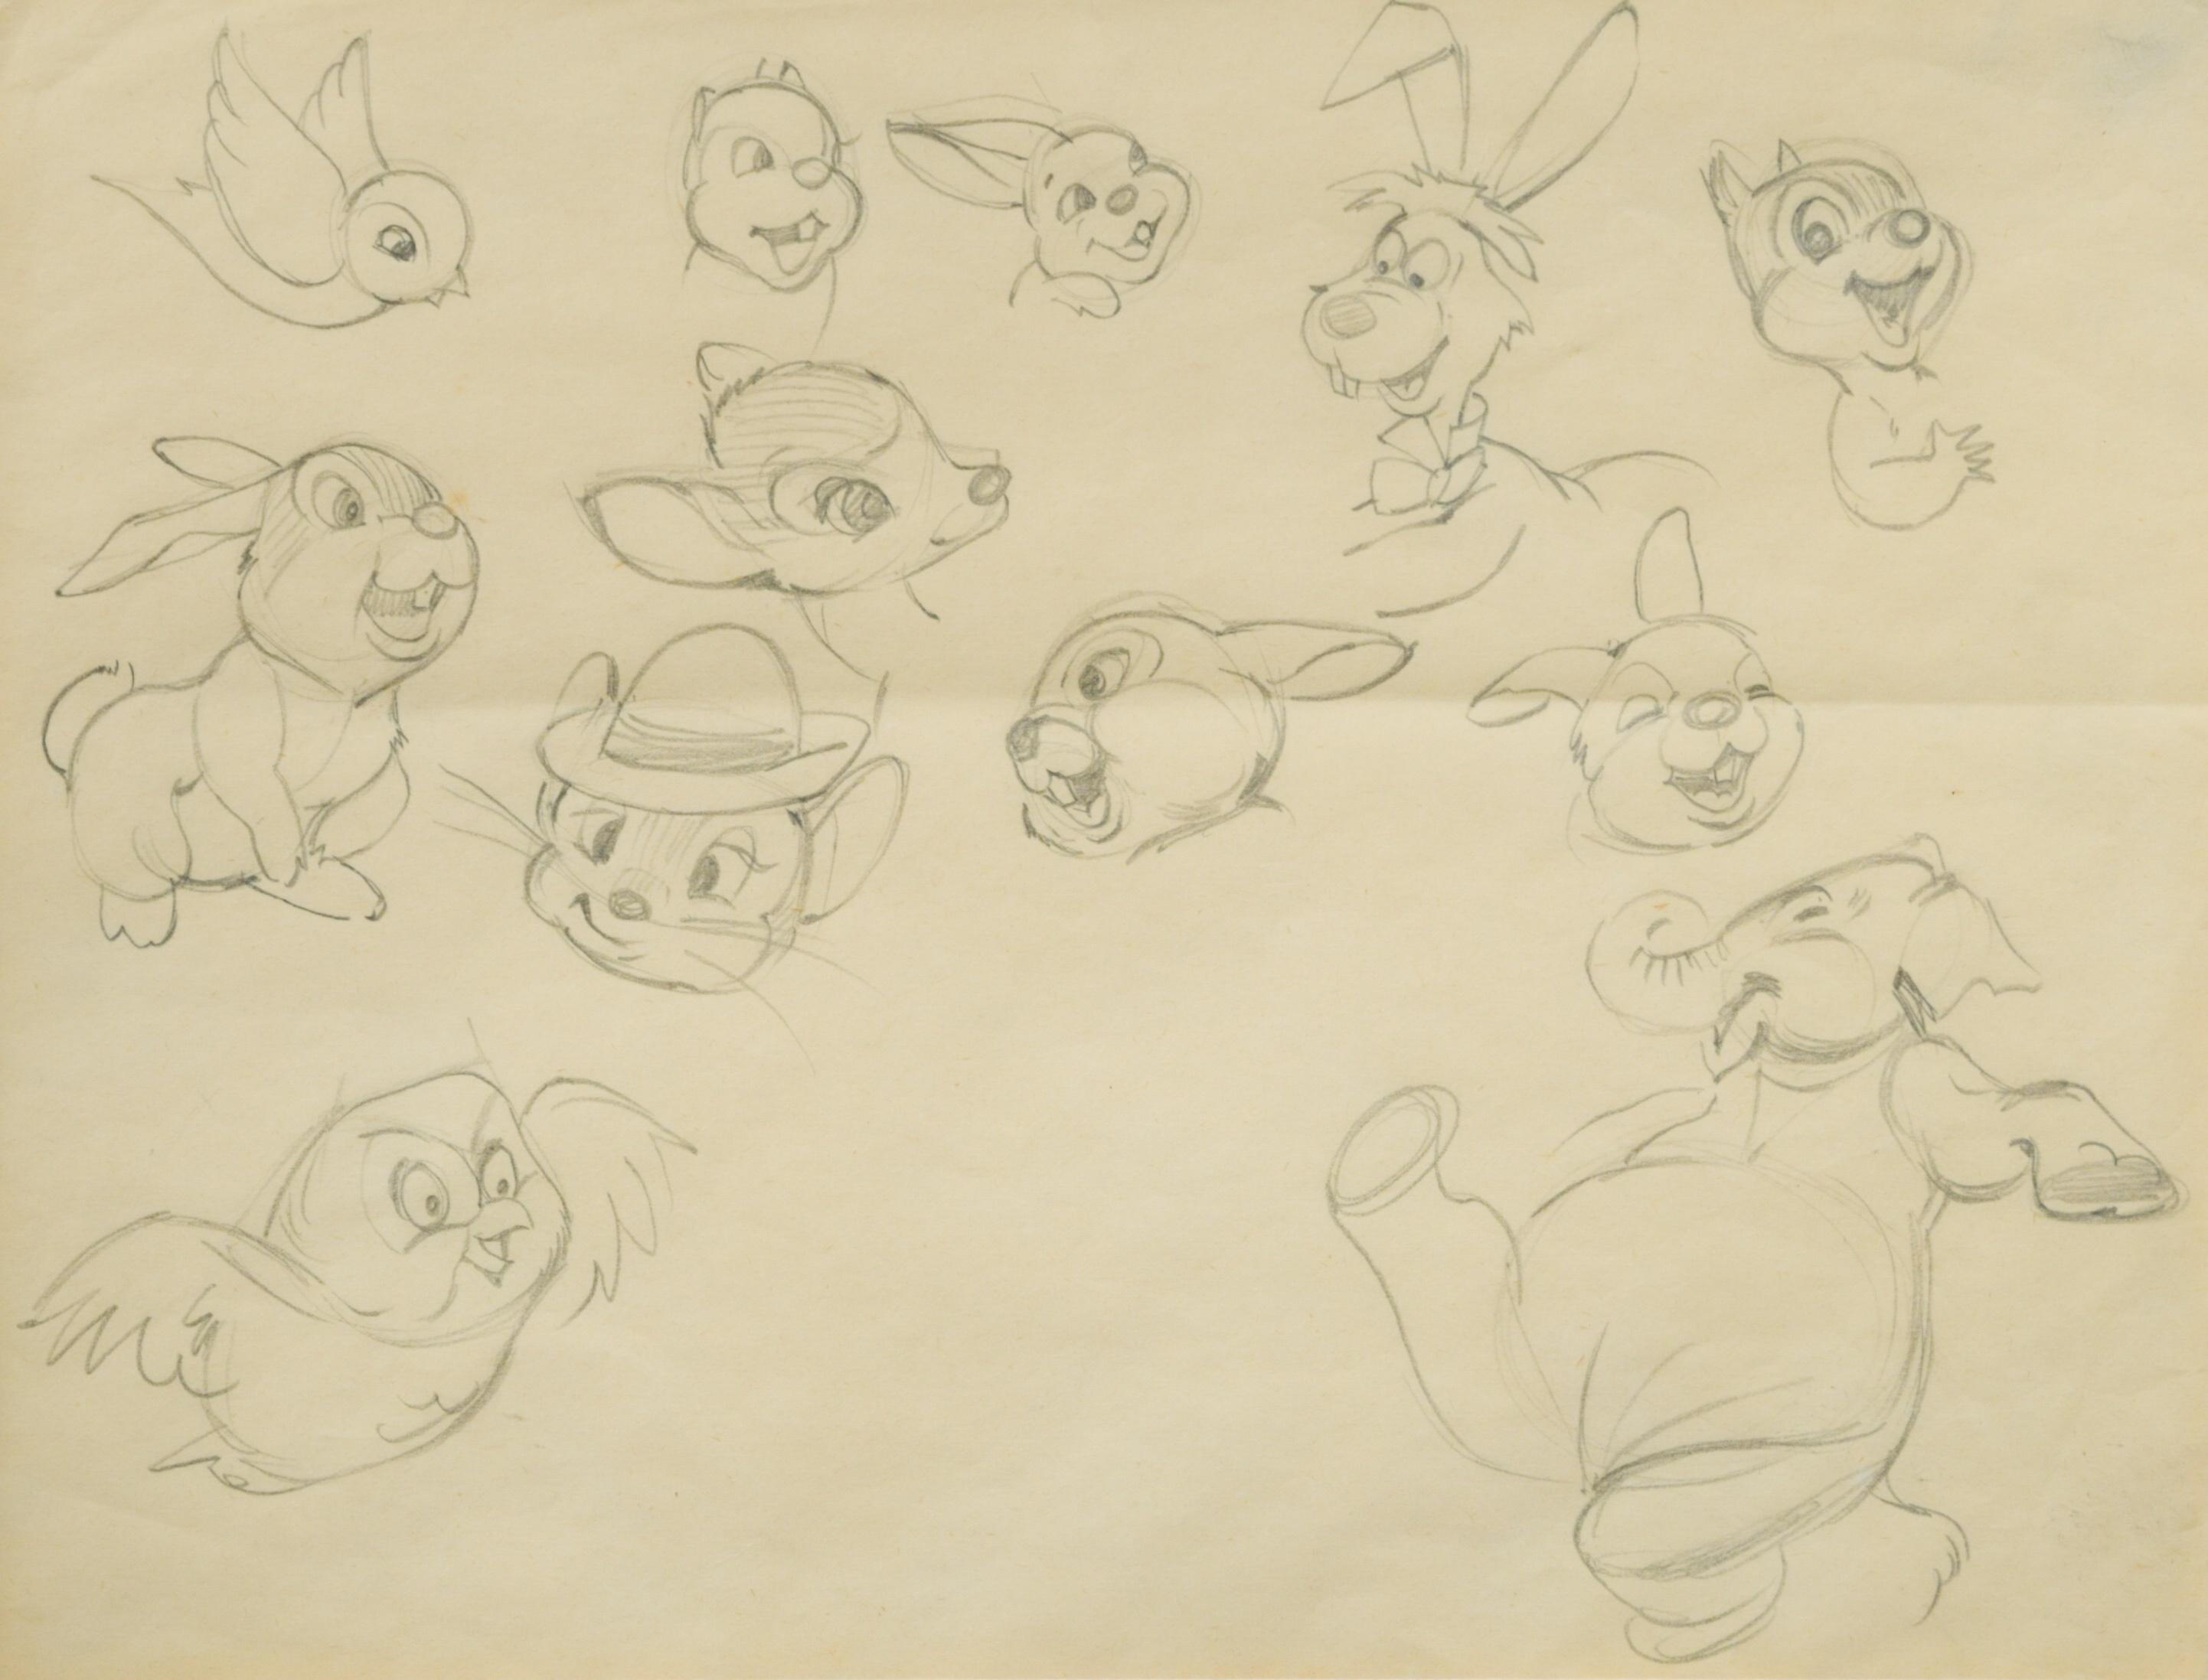 Kenneth Beeley for Walt Disney, studies of various Disney characters, circa 1949,